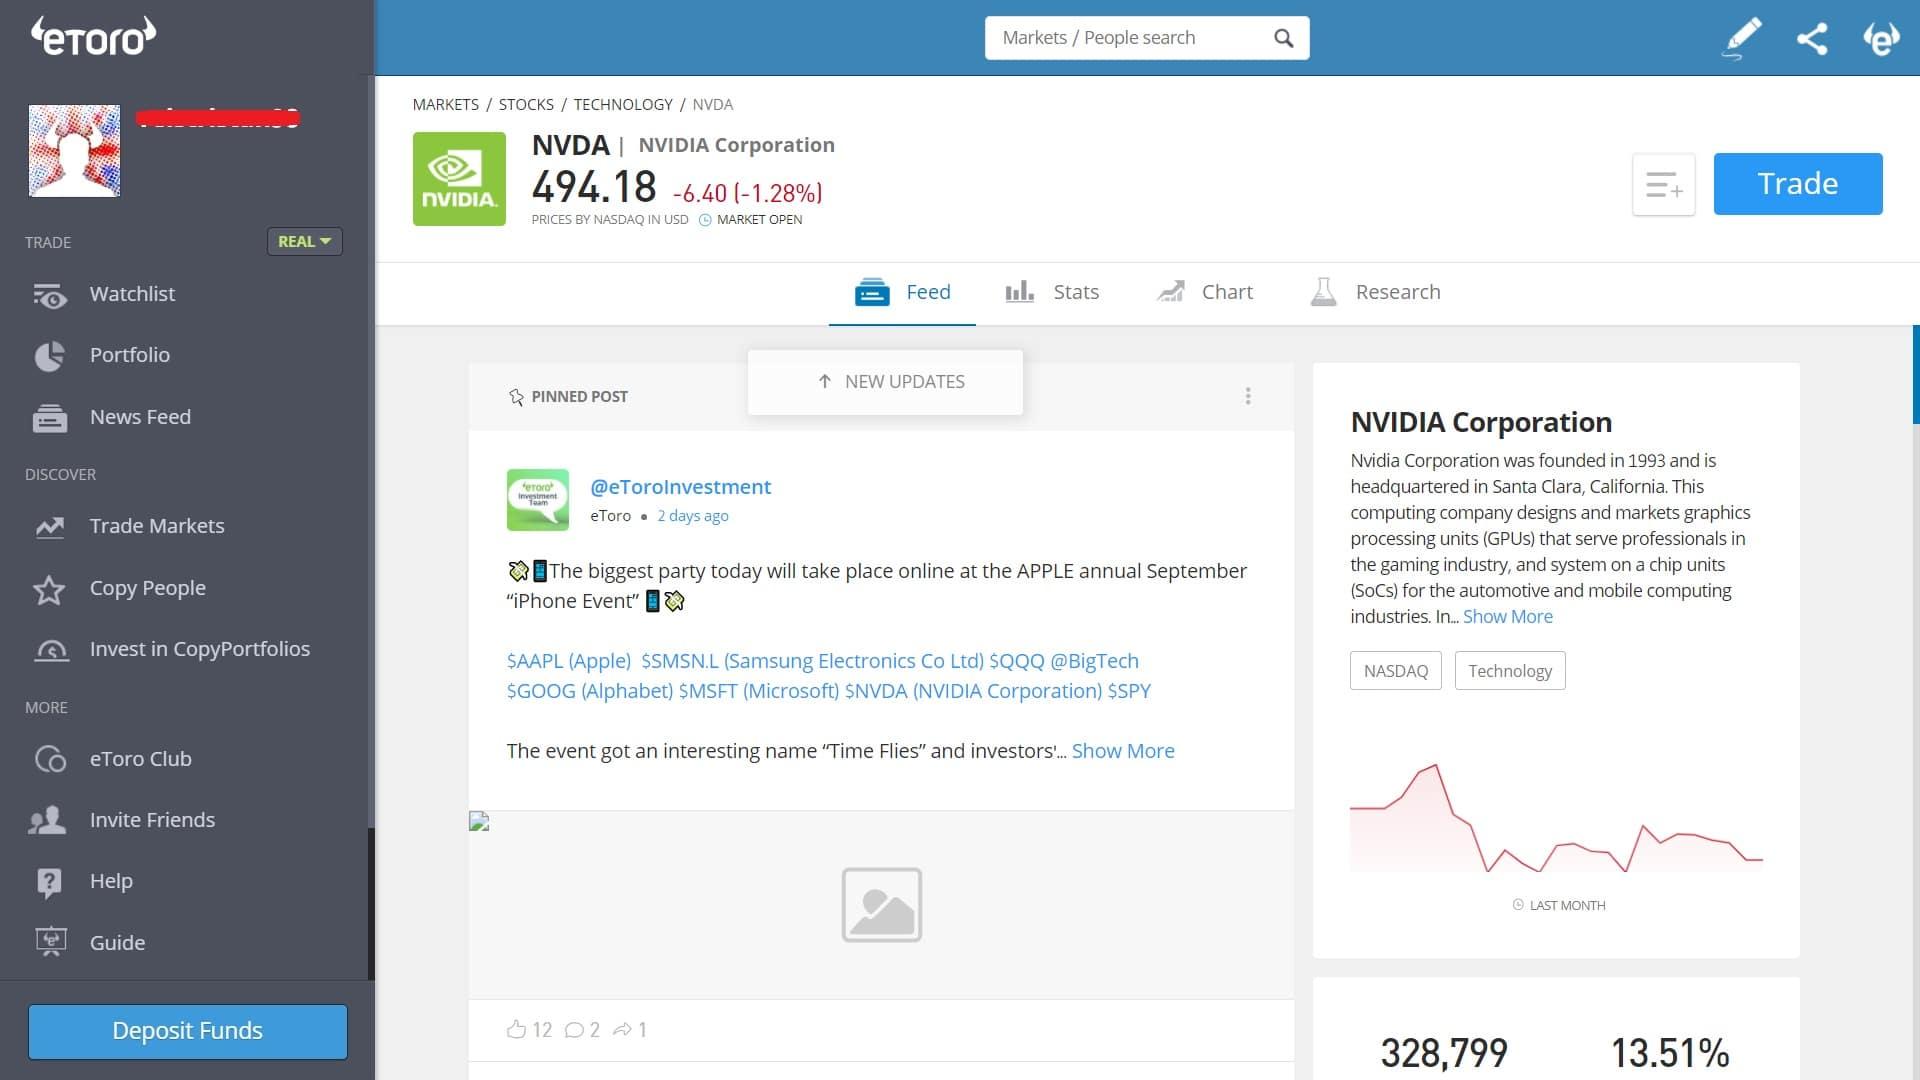 NVIDIA stock trading on eToro's platform